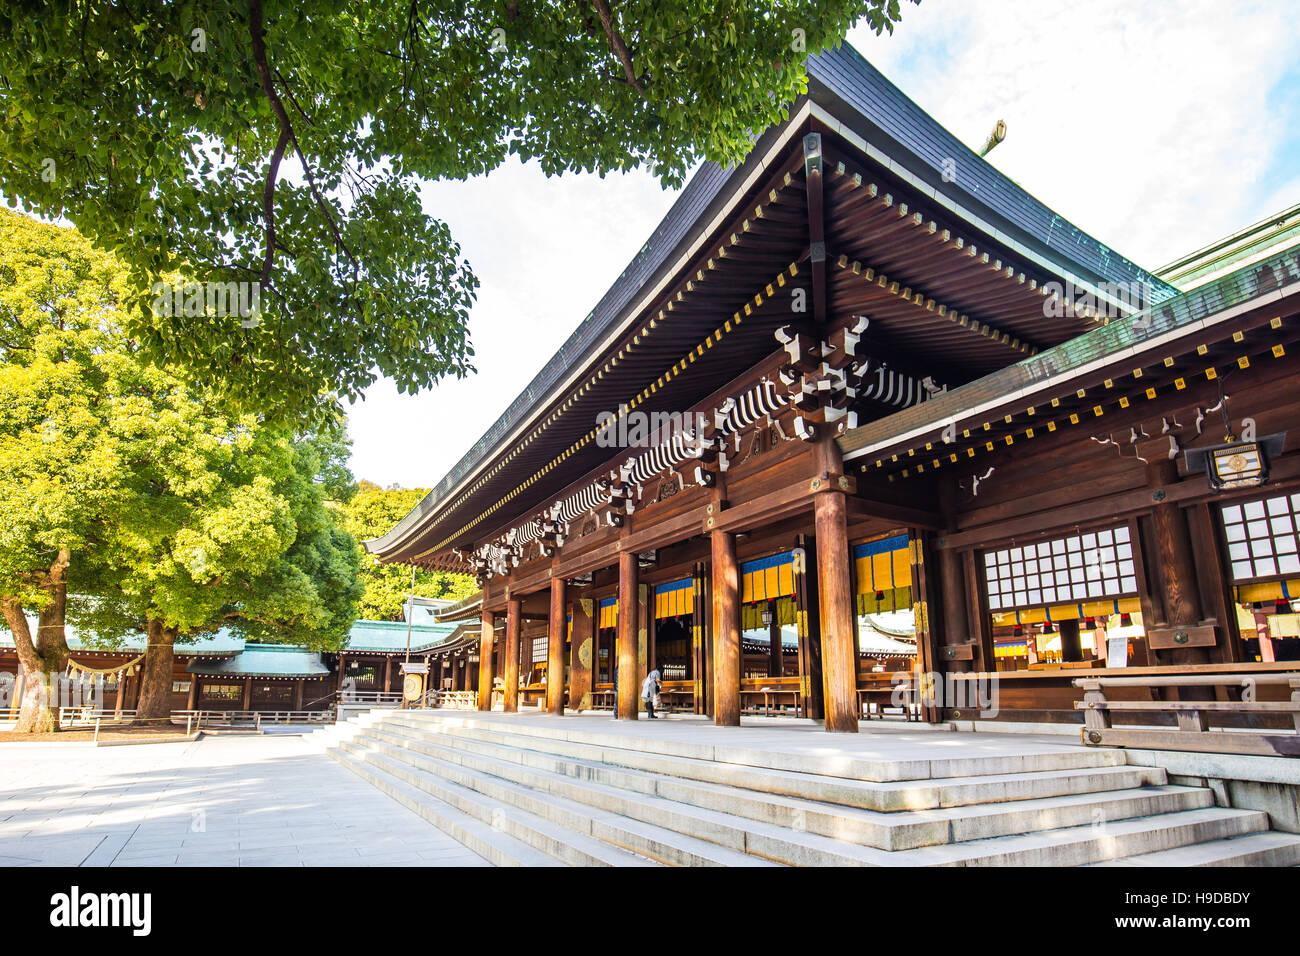 Tokyo, Giappone - 16 Febbraio 2015: Meiji Jingu brillare in Shibuya, Tokyo - Giappone. Immagini Stock